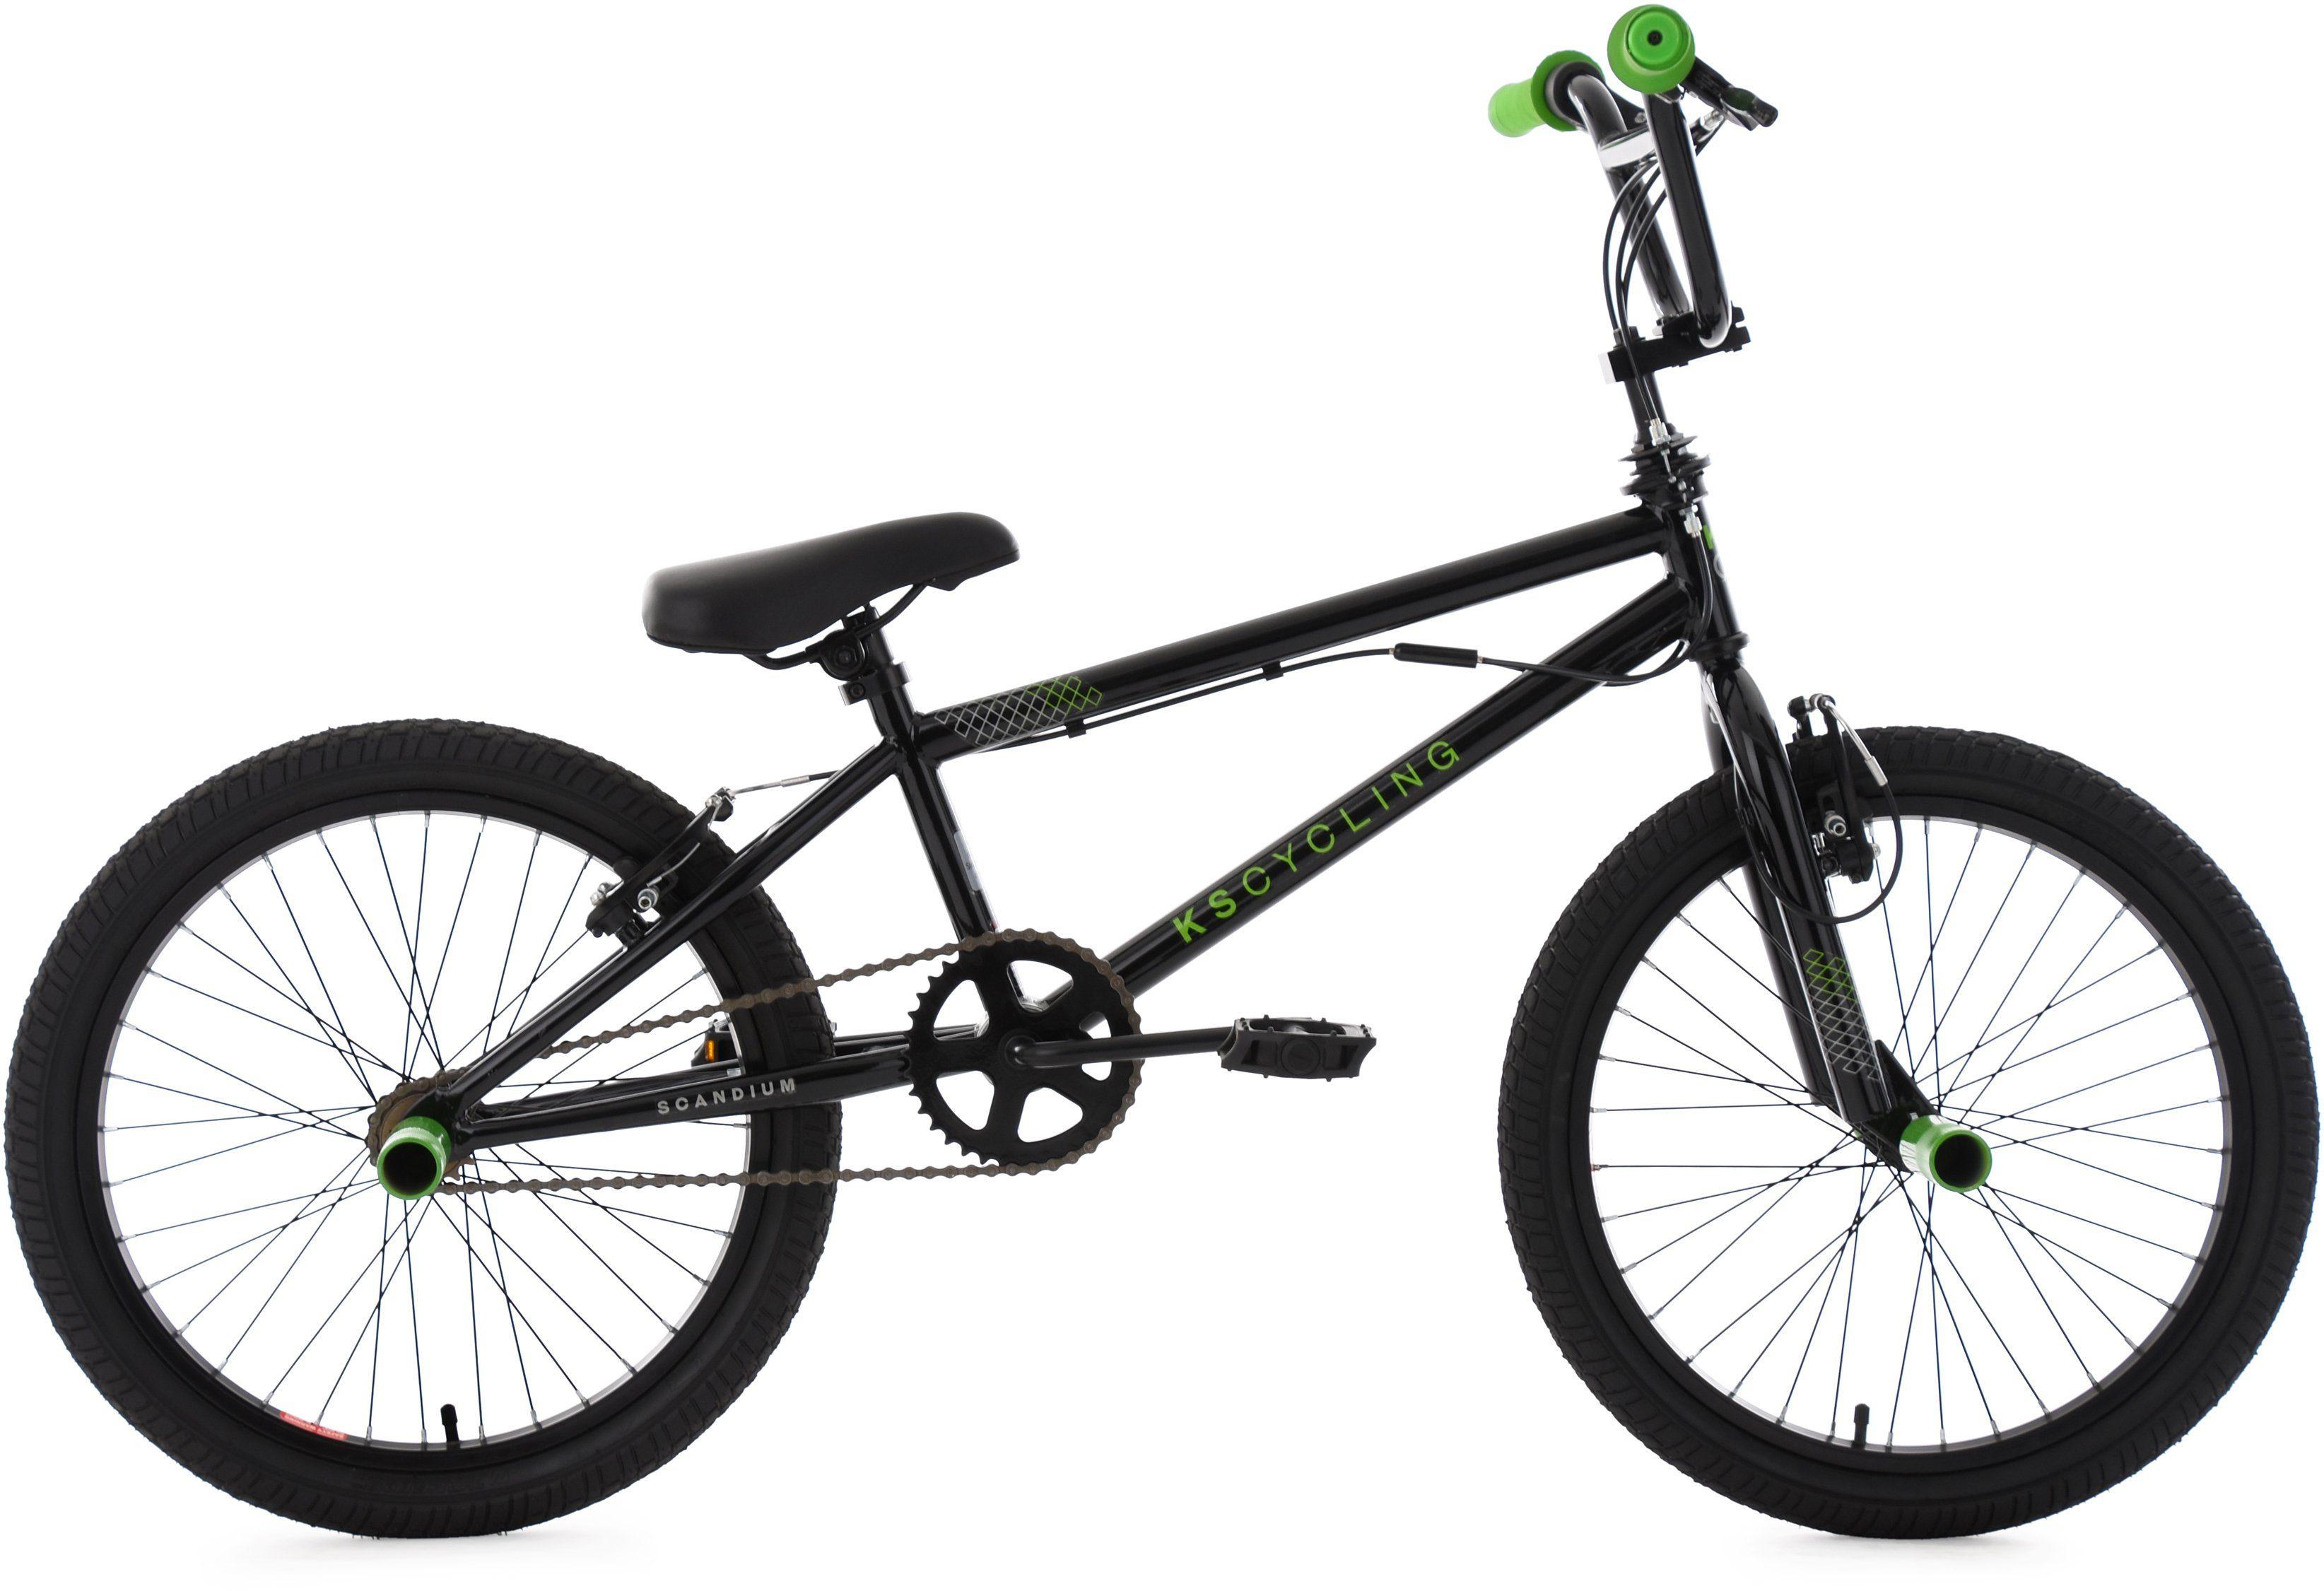 KS Cycling BMX Fahrrad, 20 Zoll, schwarz-grün, »Scandium«